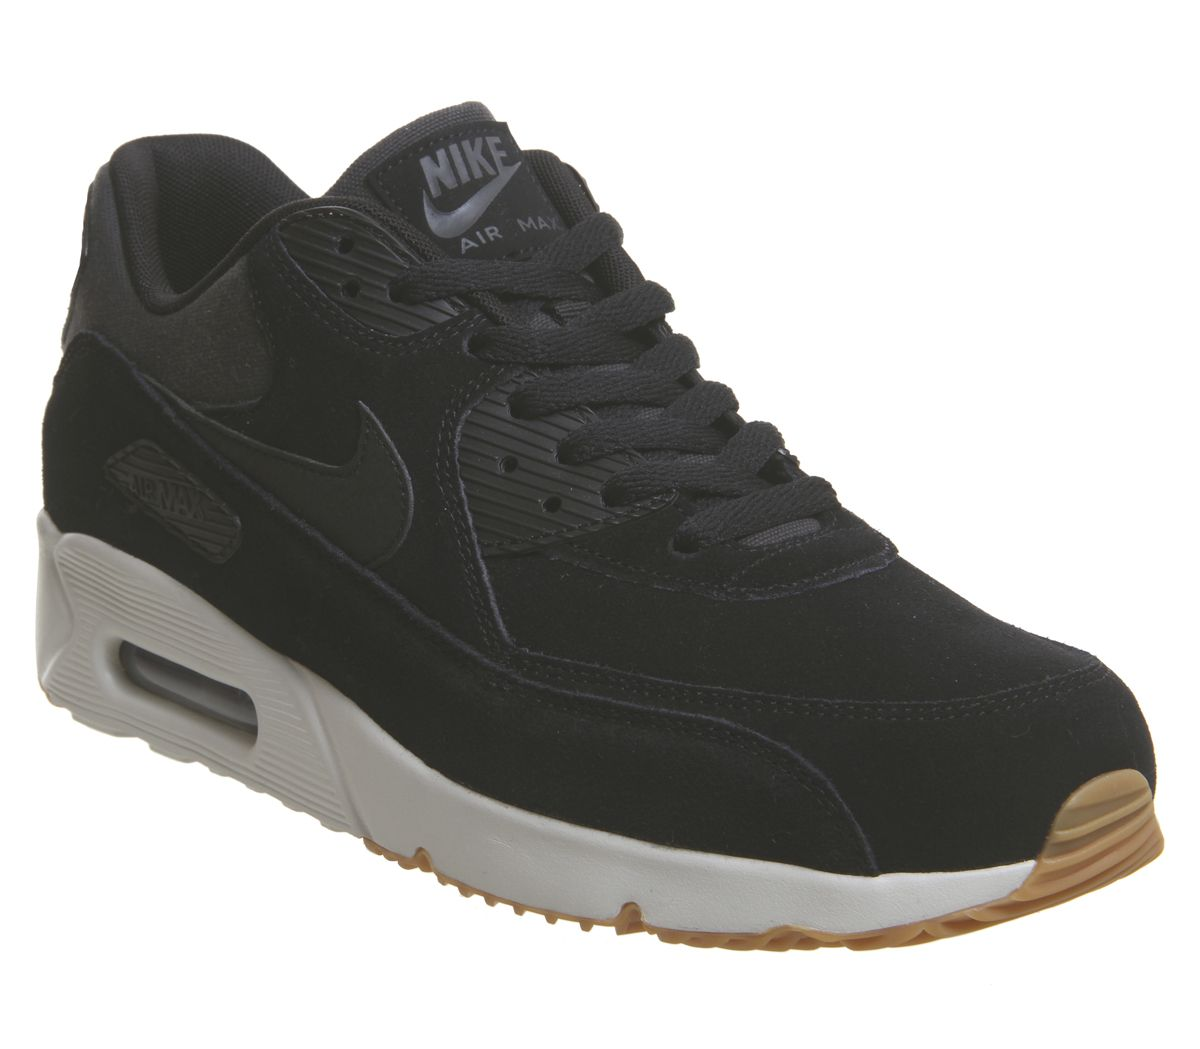 9507ad19c71 Nike Air Max 90 Ultra 2.0 Trainers Black Light Bone Gum - His trainers